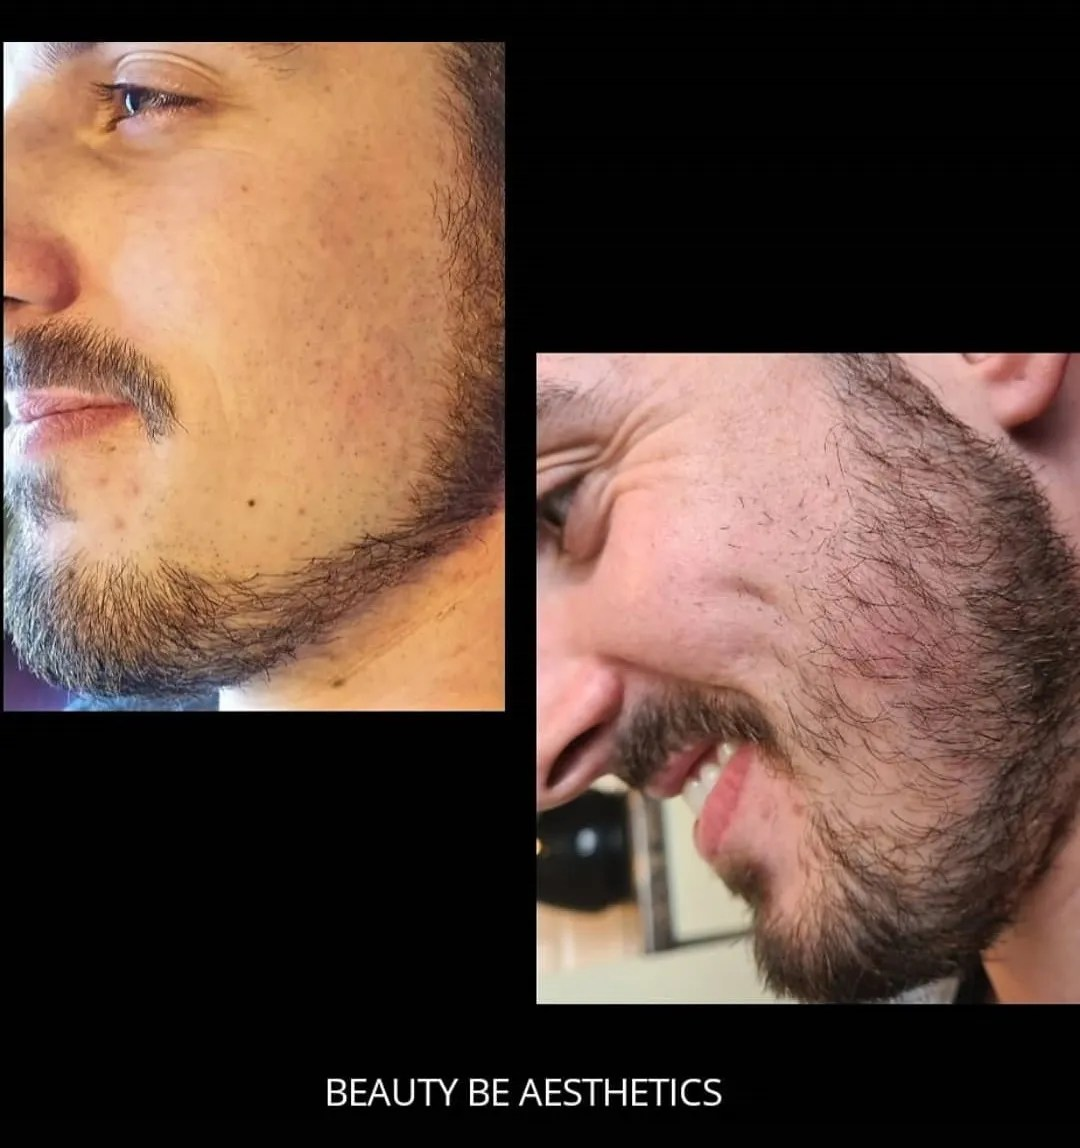 Microneedling for beard growth